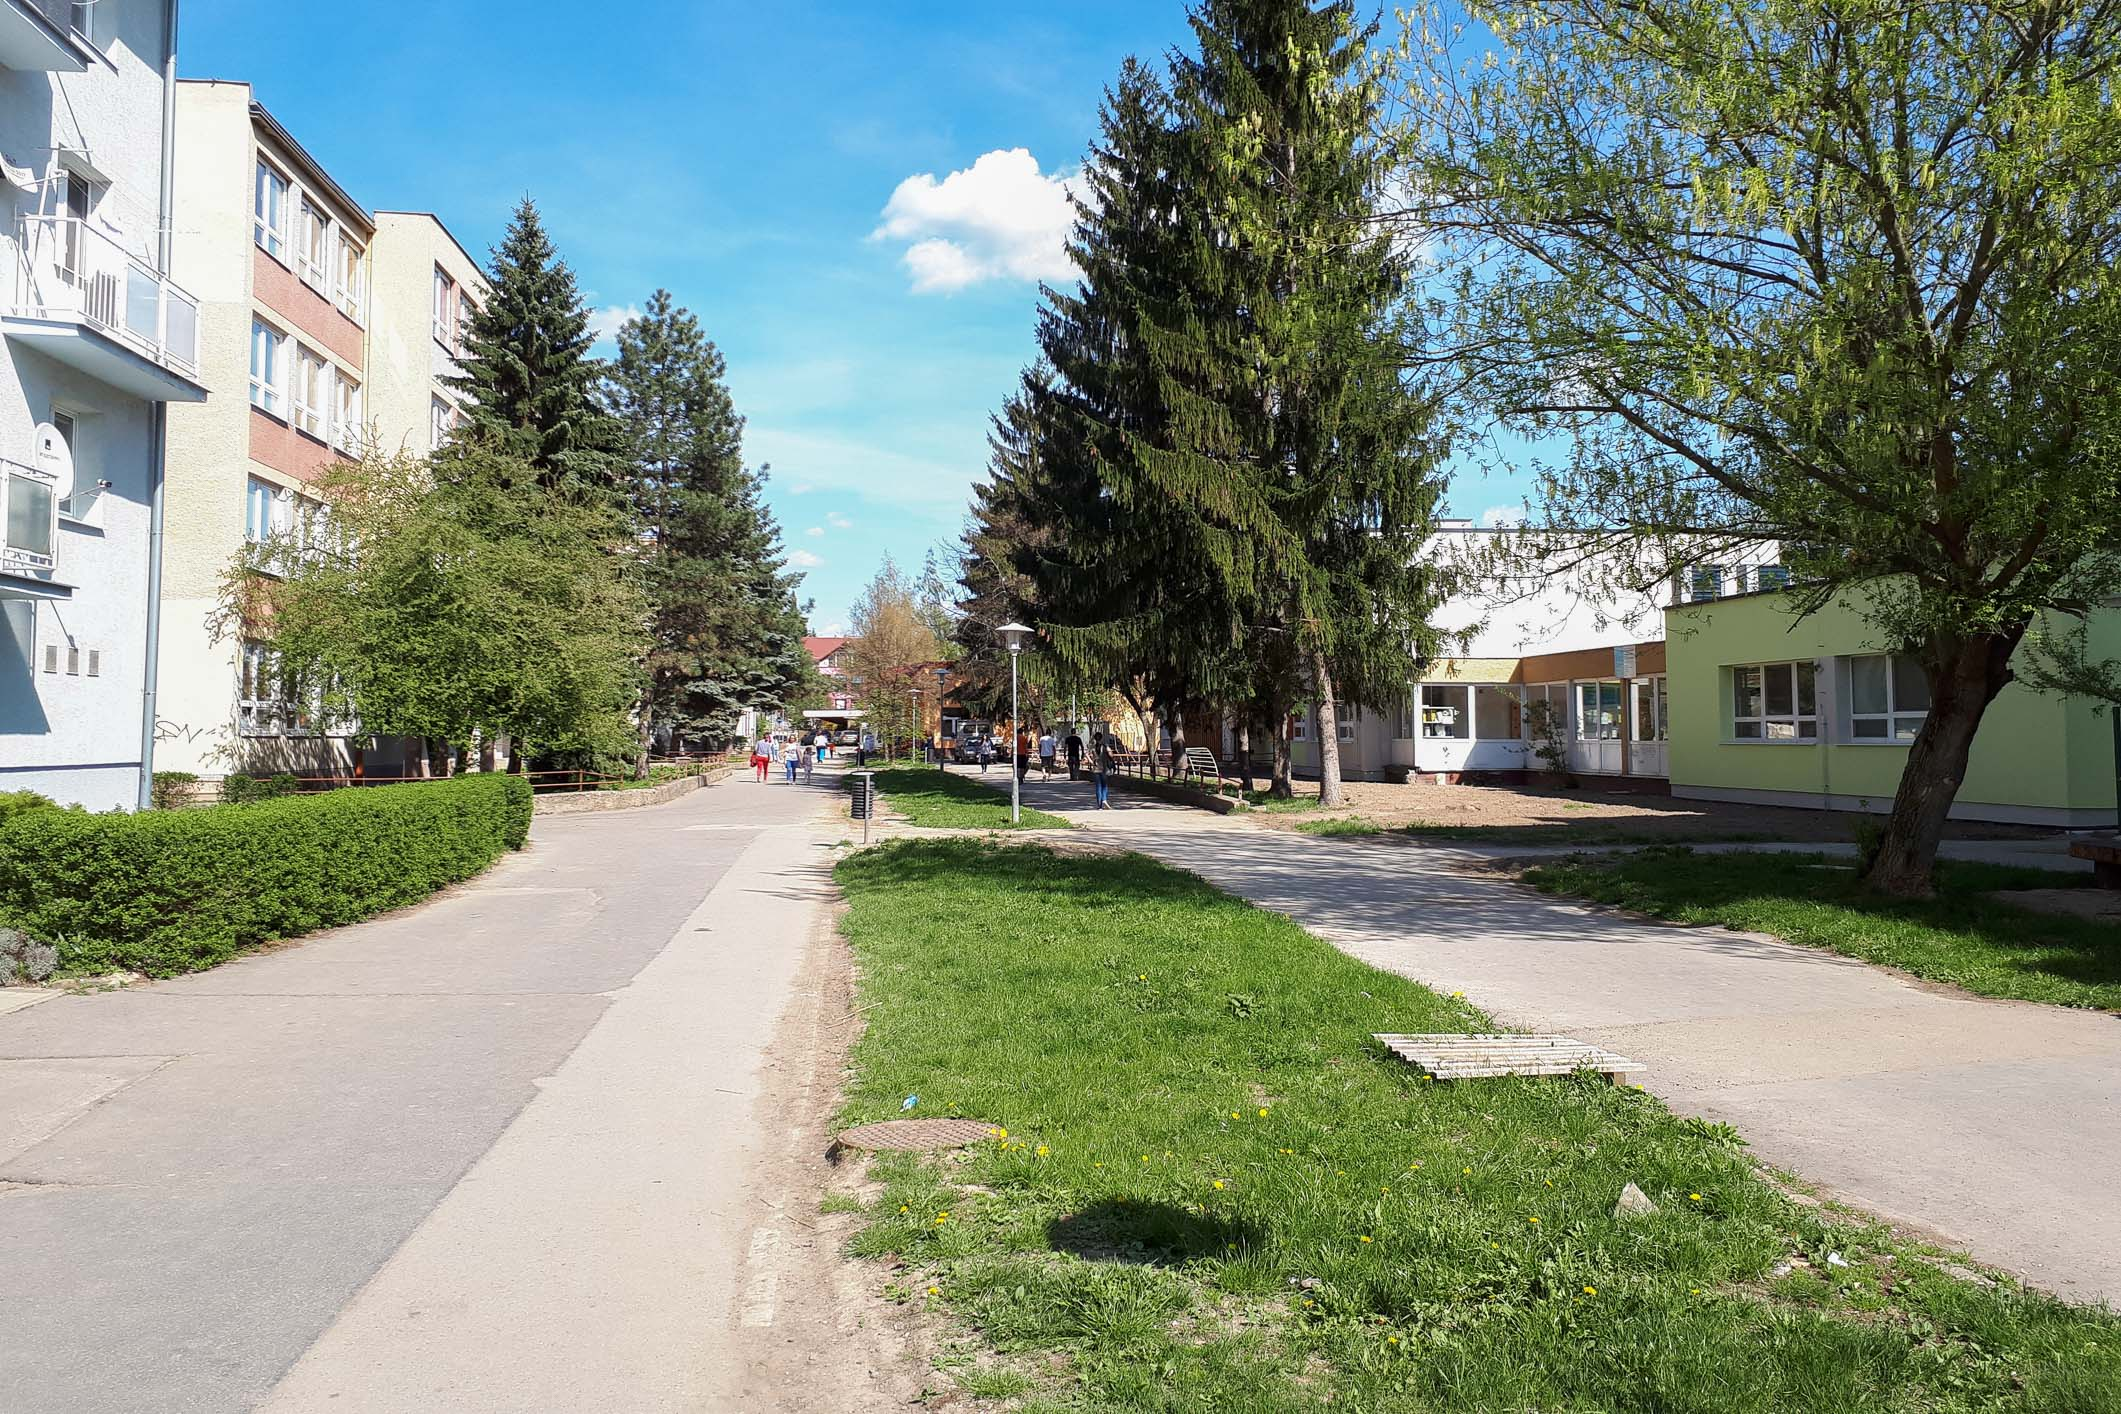 vnutroblok-hrnciarska-zv-pred